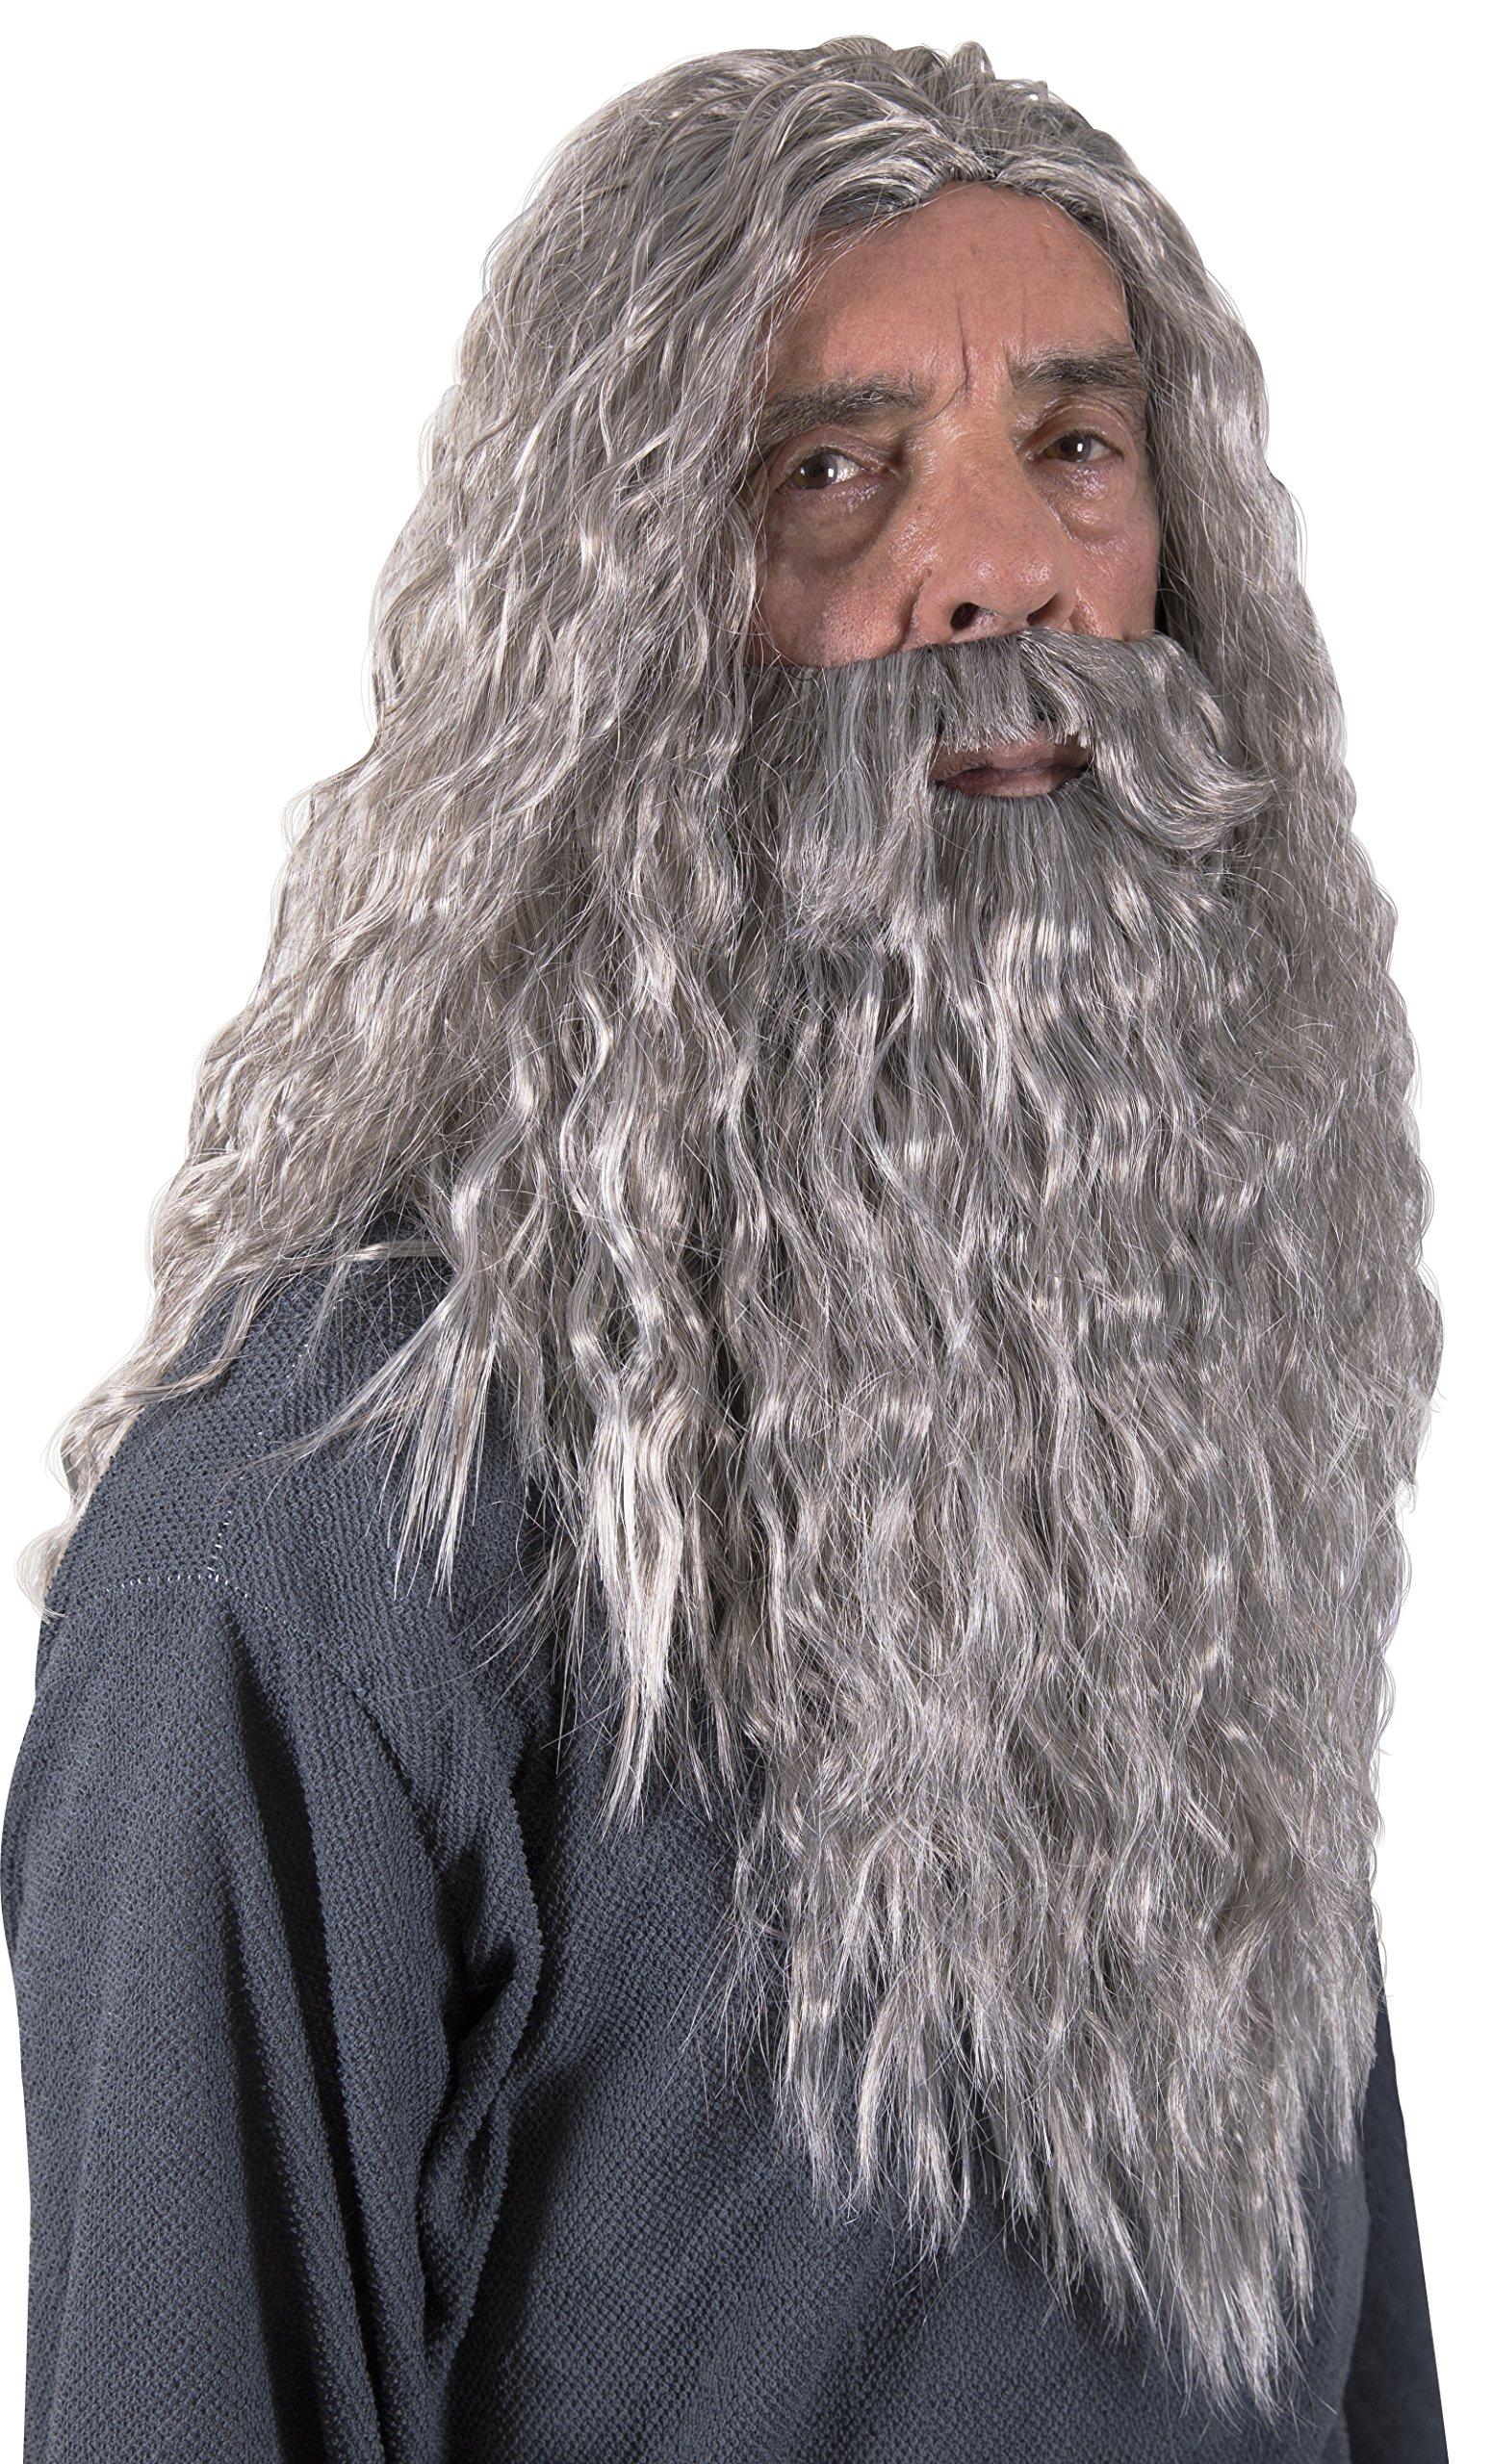 Kangaroo Halloween Accessories - Wizard Wig by Kangaroo